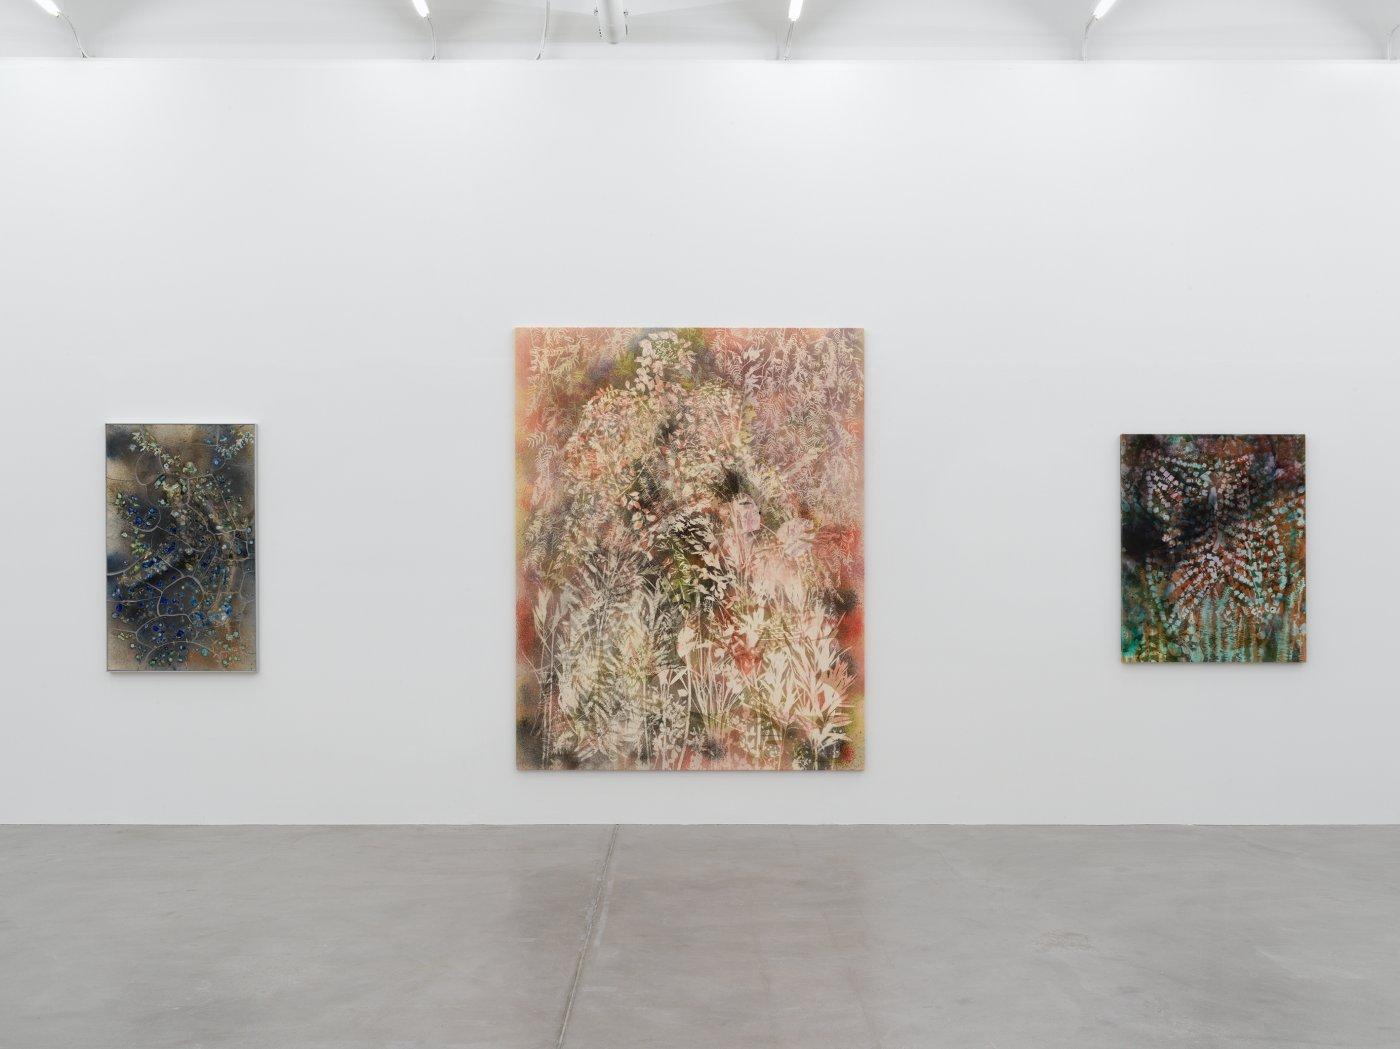 Galerie Eva Presenhuber Maag Areal Sam Falls 8